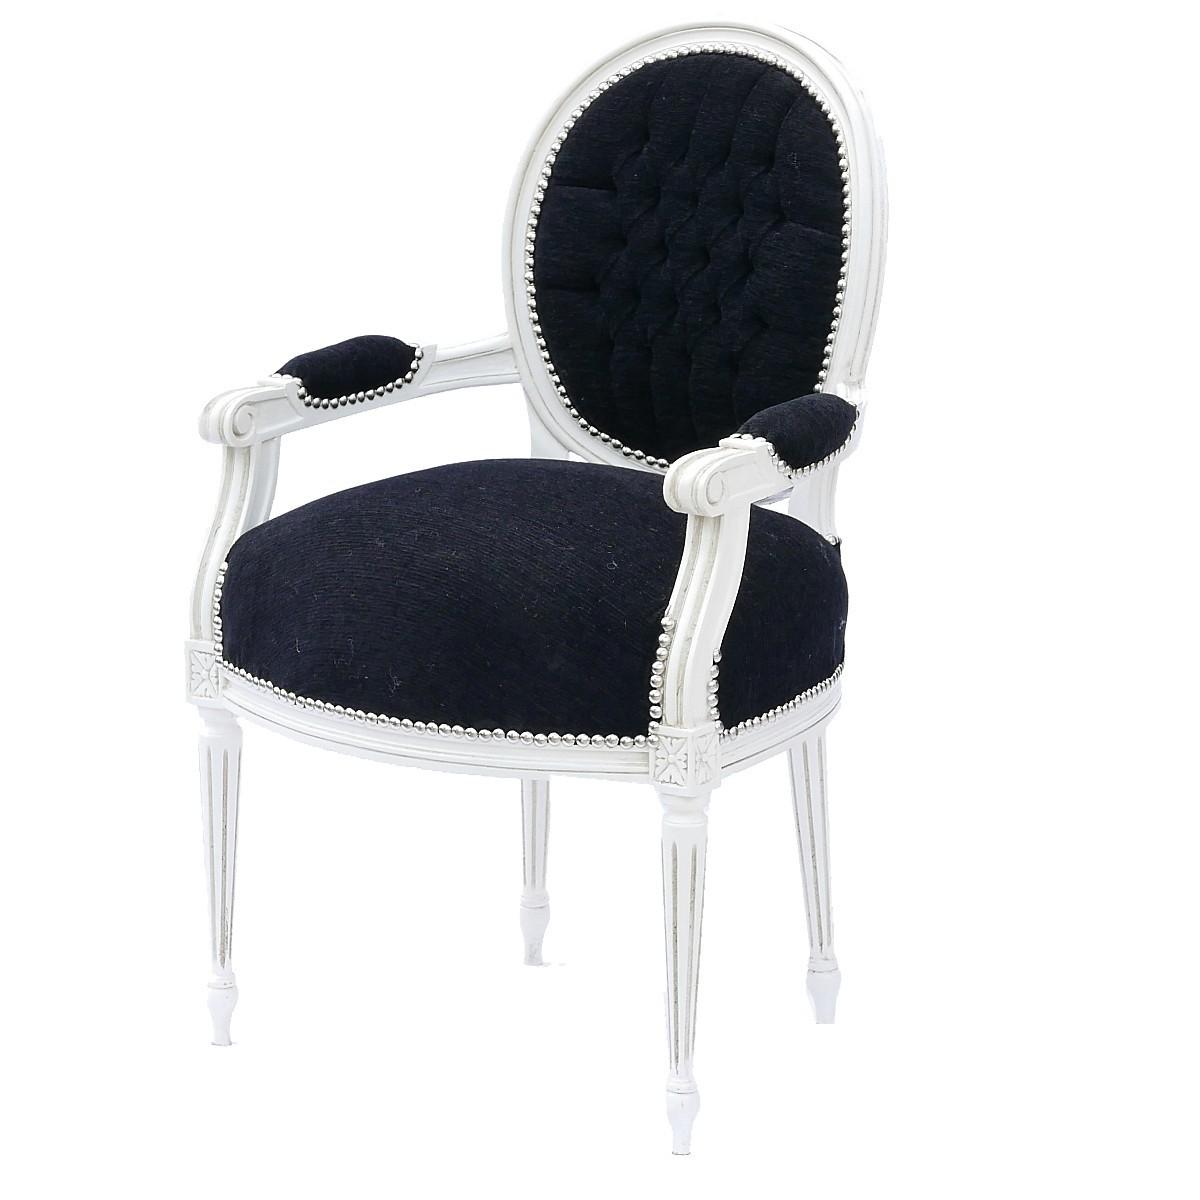 salon stuhl edel barock schwarze sitzfl che aus samtstoff rahmen wei massivholz. Black Bedroom Furniture Sets. Home Design Ideas